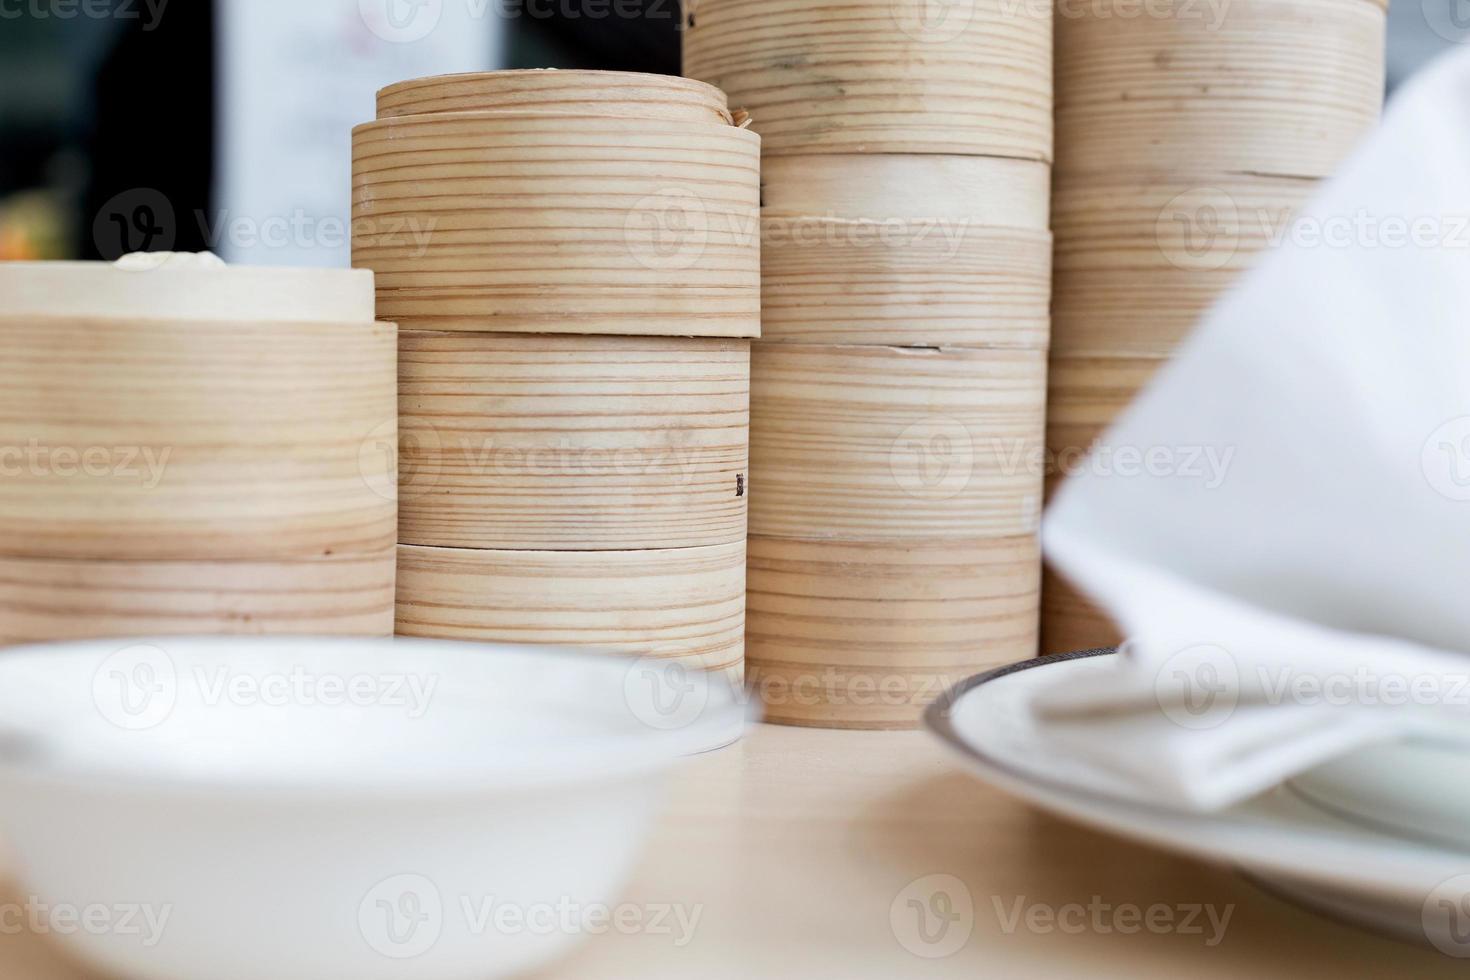 panino cinese cotto a vapore in cestino di bambù foto